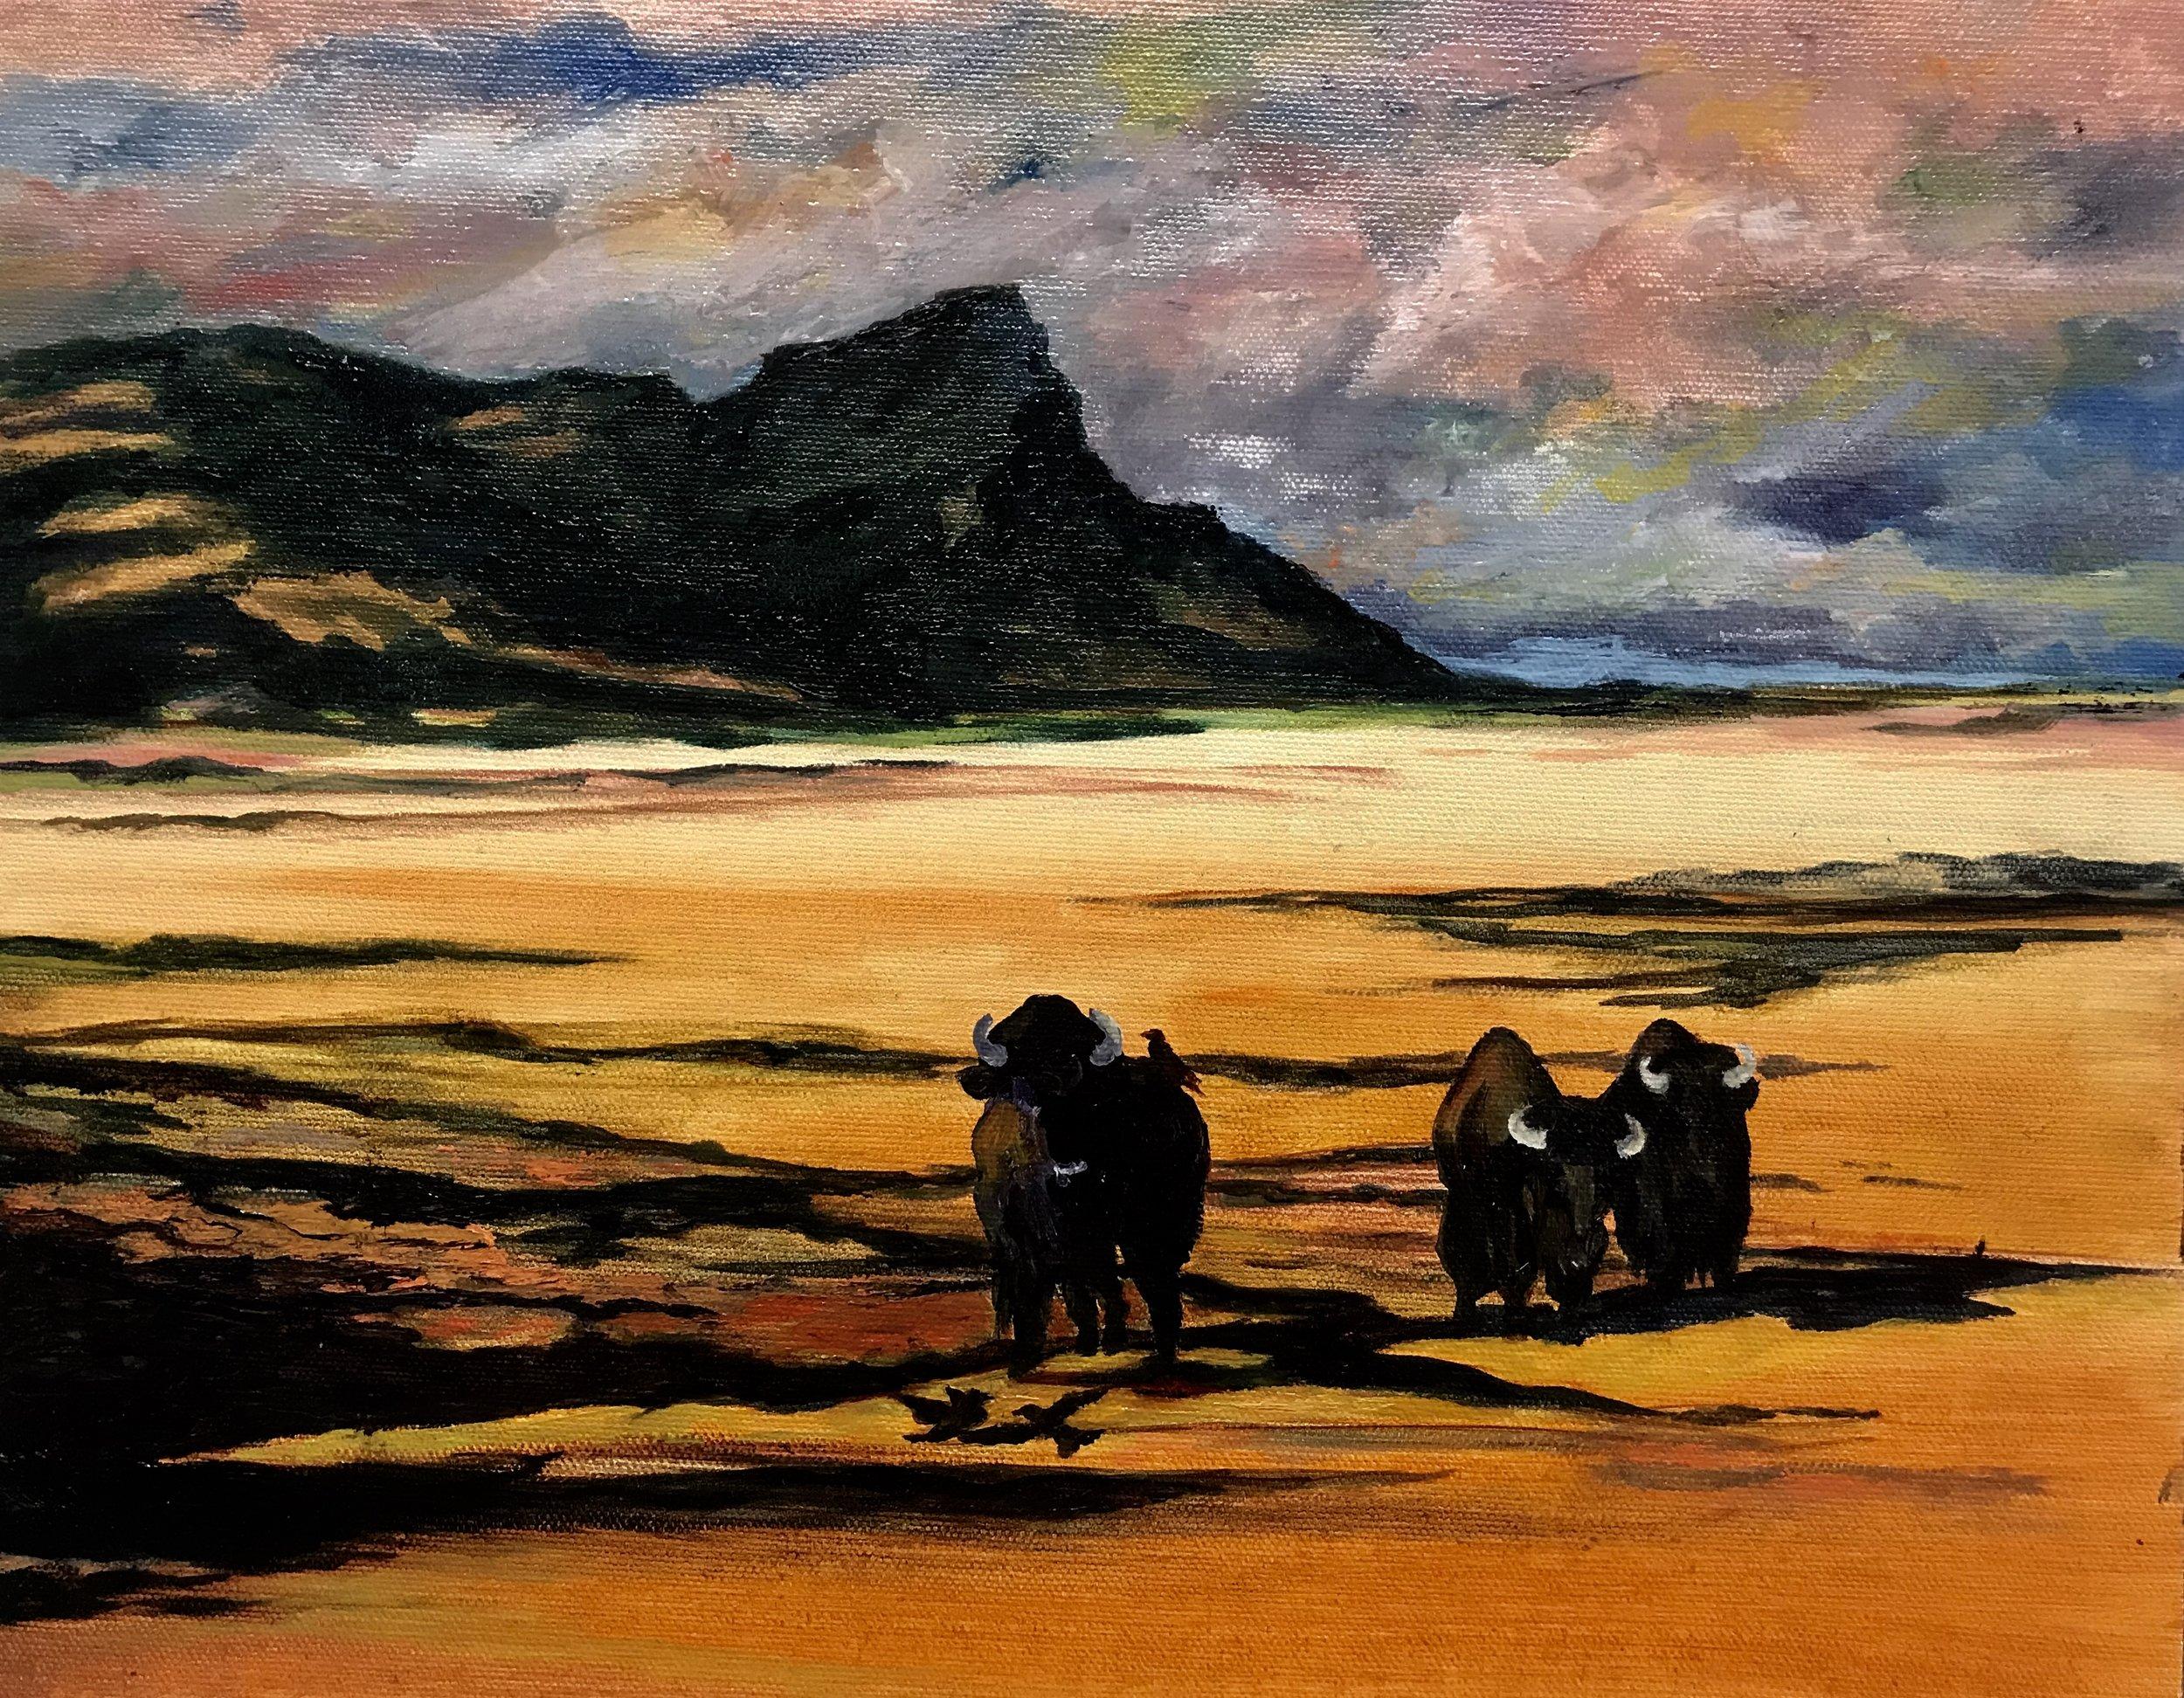 AMERICAN BISON  11 X 14  Oil on canvas  Cheri GInsburg ©